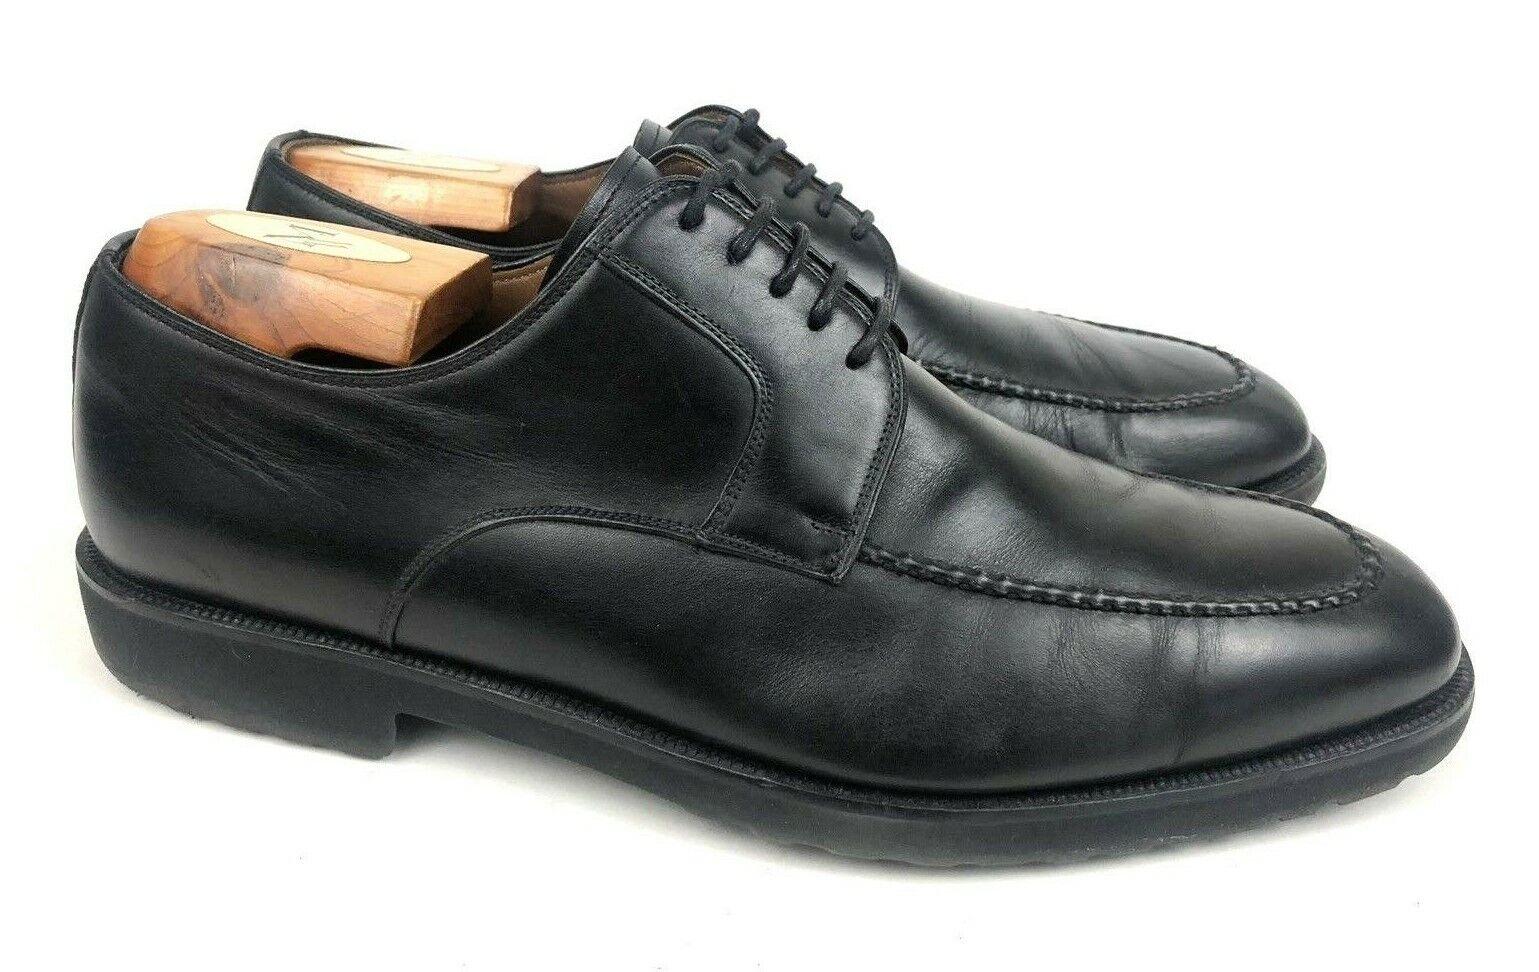 MAGNANNI Spain   Romelo Black Leather Lace Up Moc Toe Derby Oxford   Men's 9.5